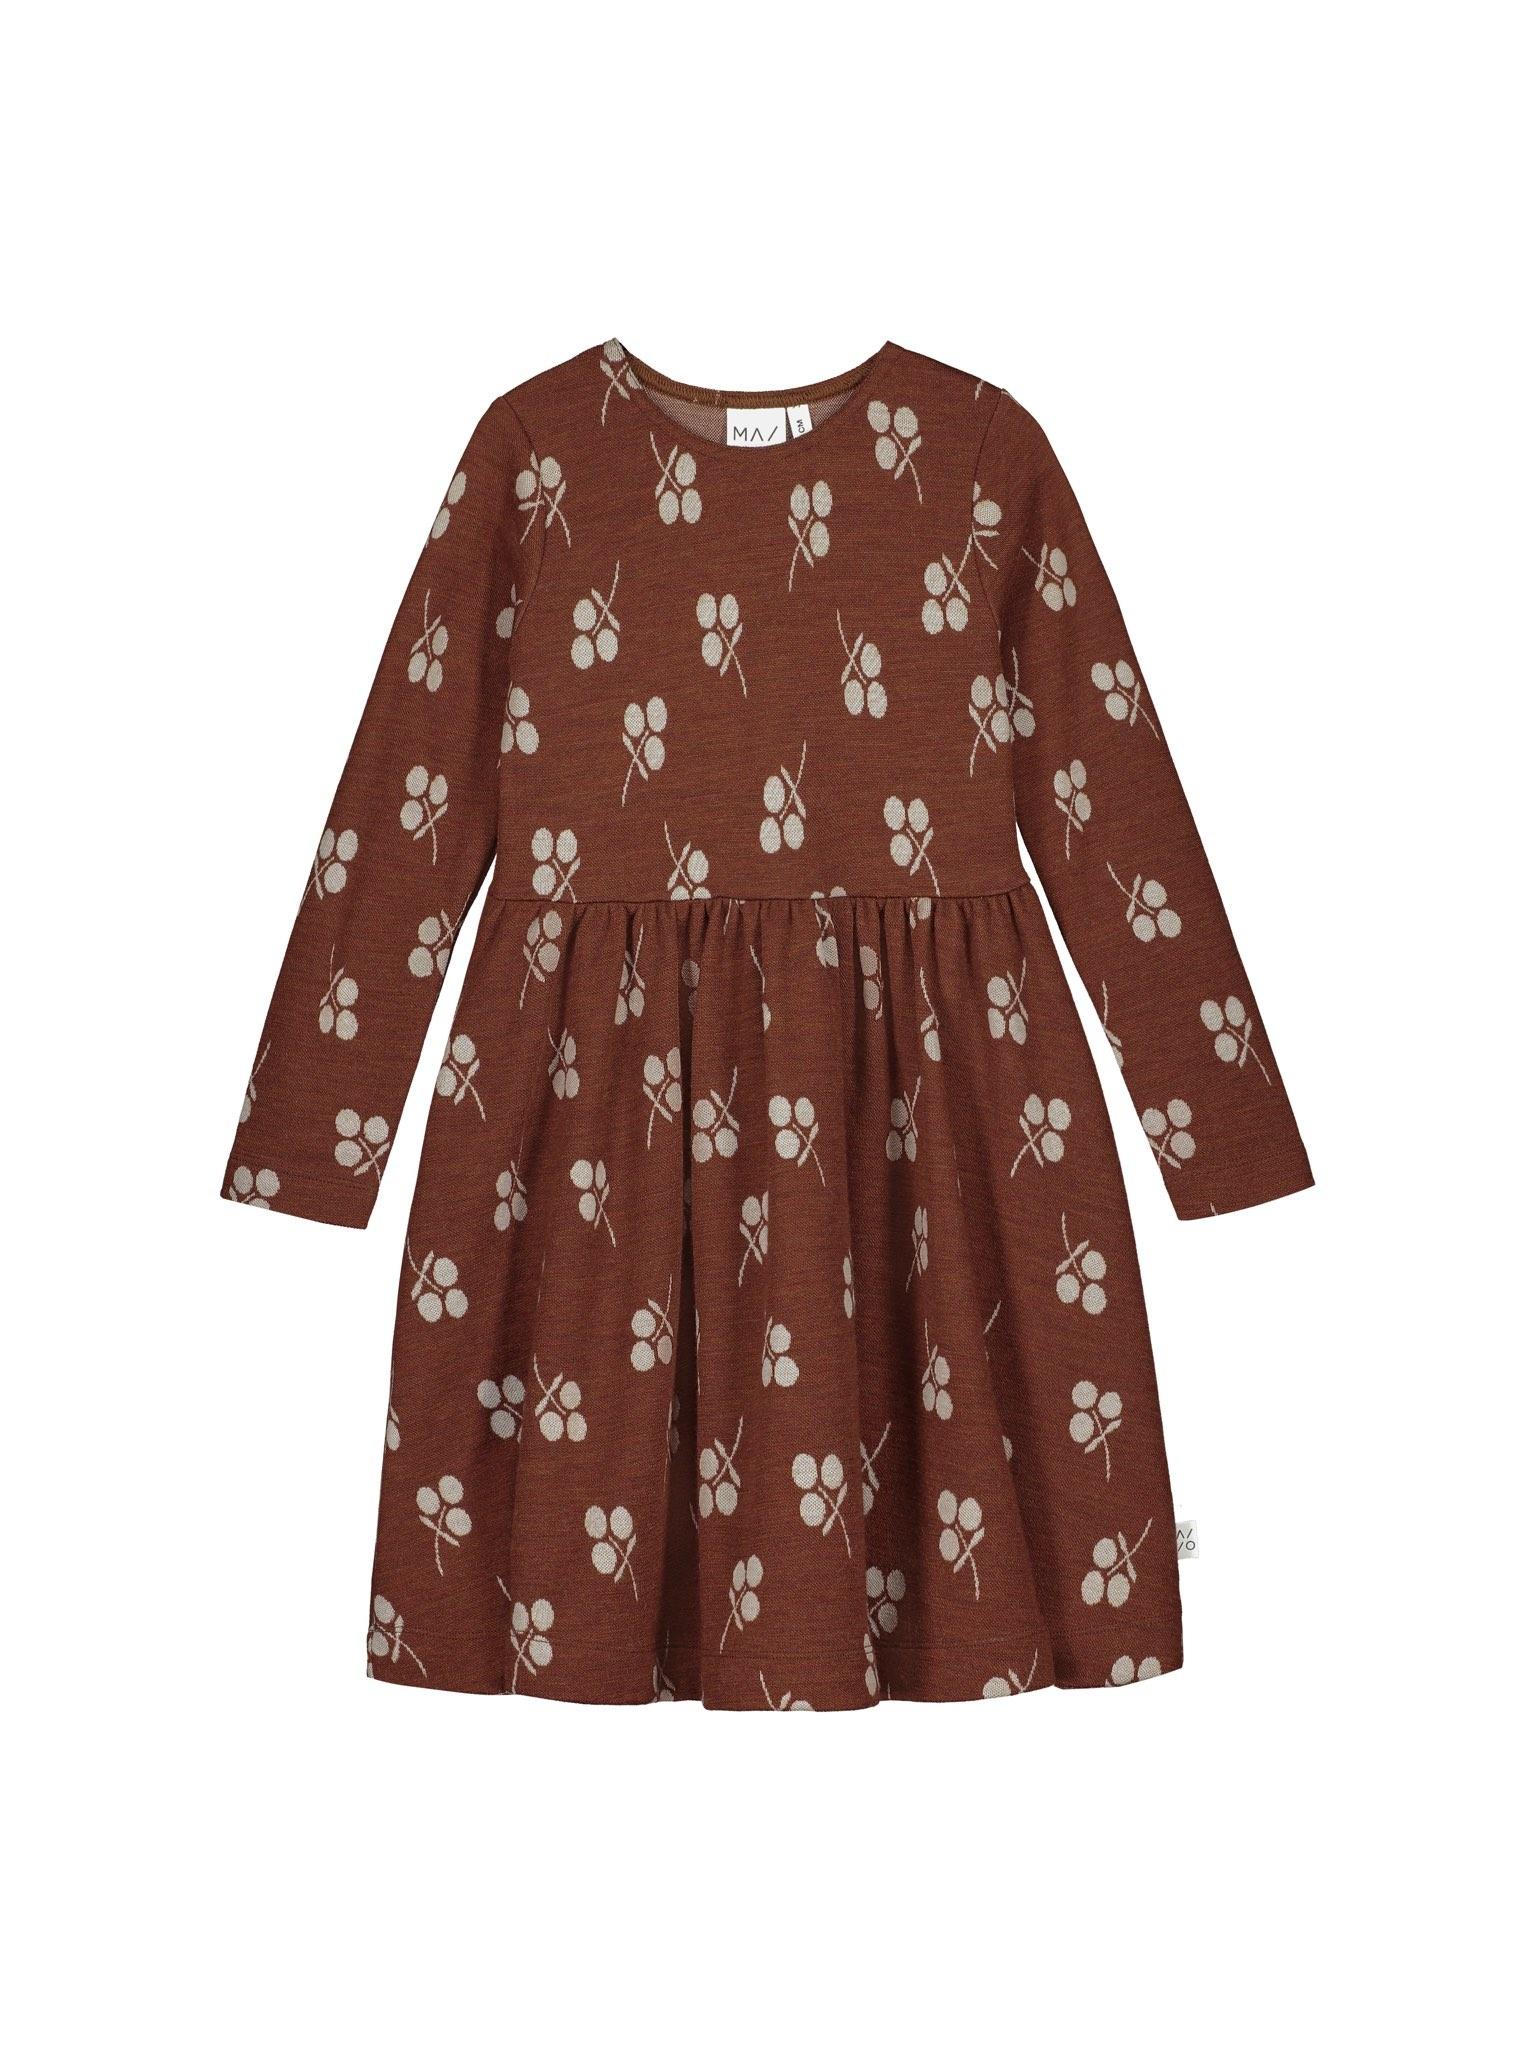 Merinowolle Kleid mit Jacquard-Muster